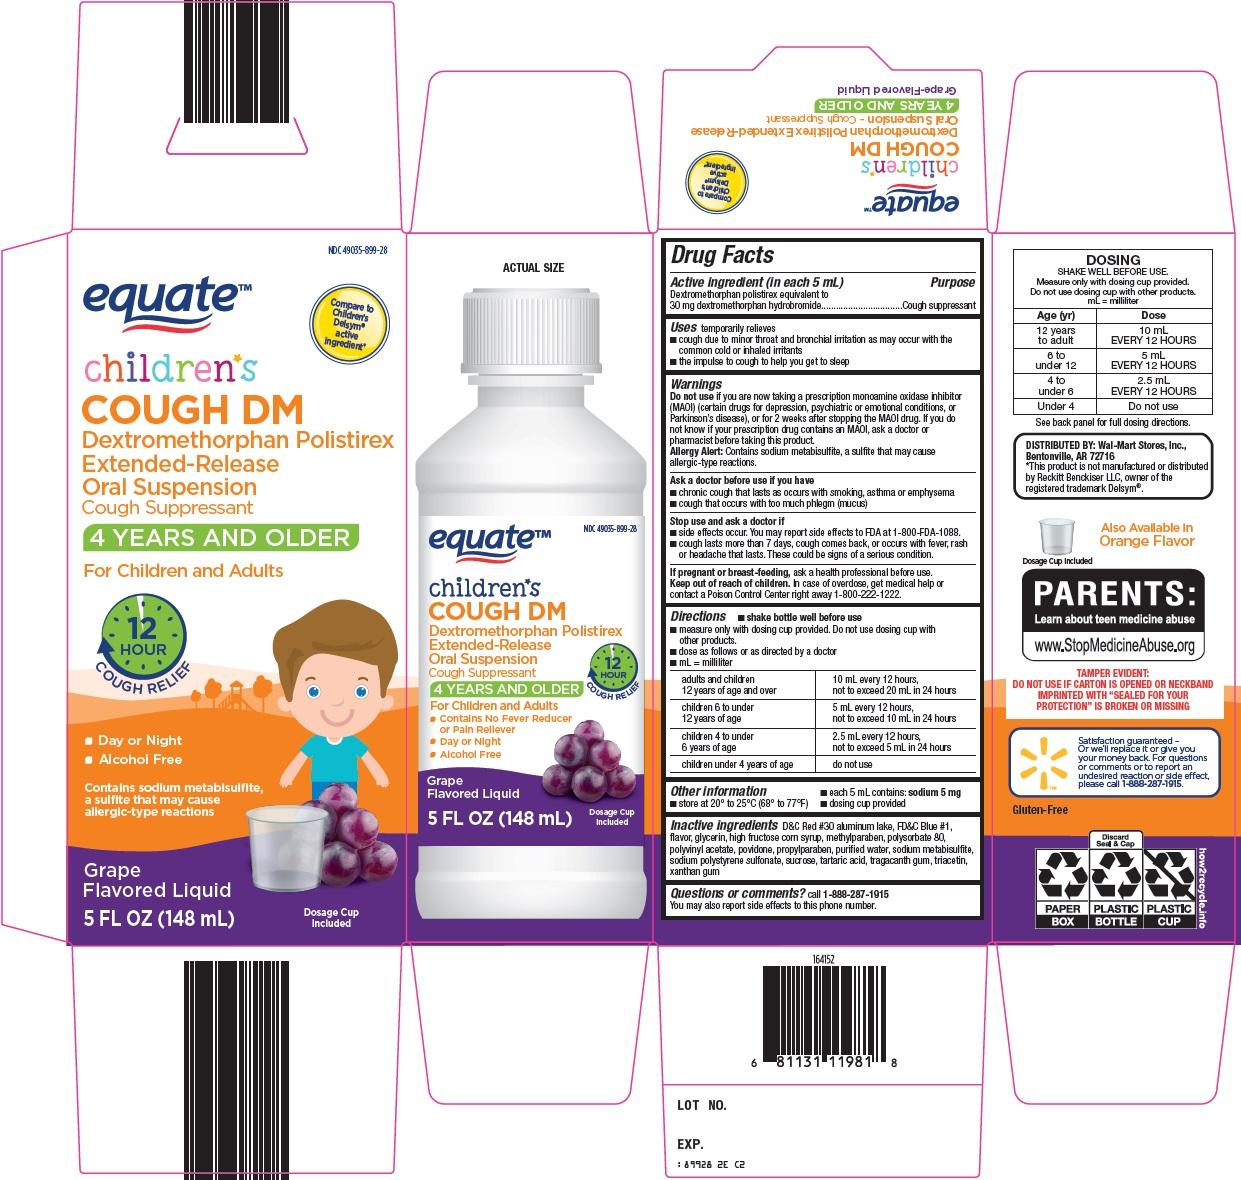 childrens-cough-DM-image